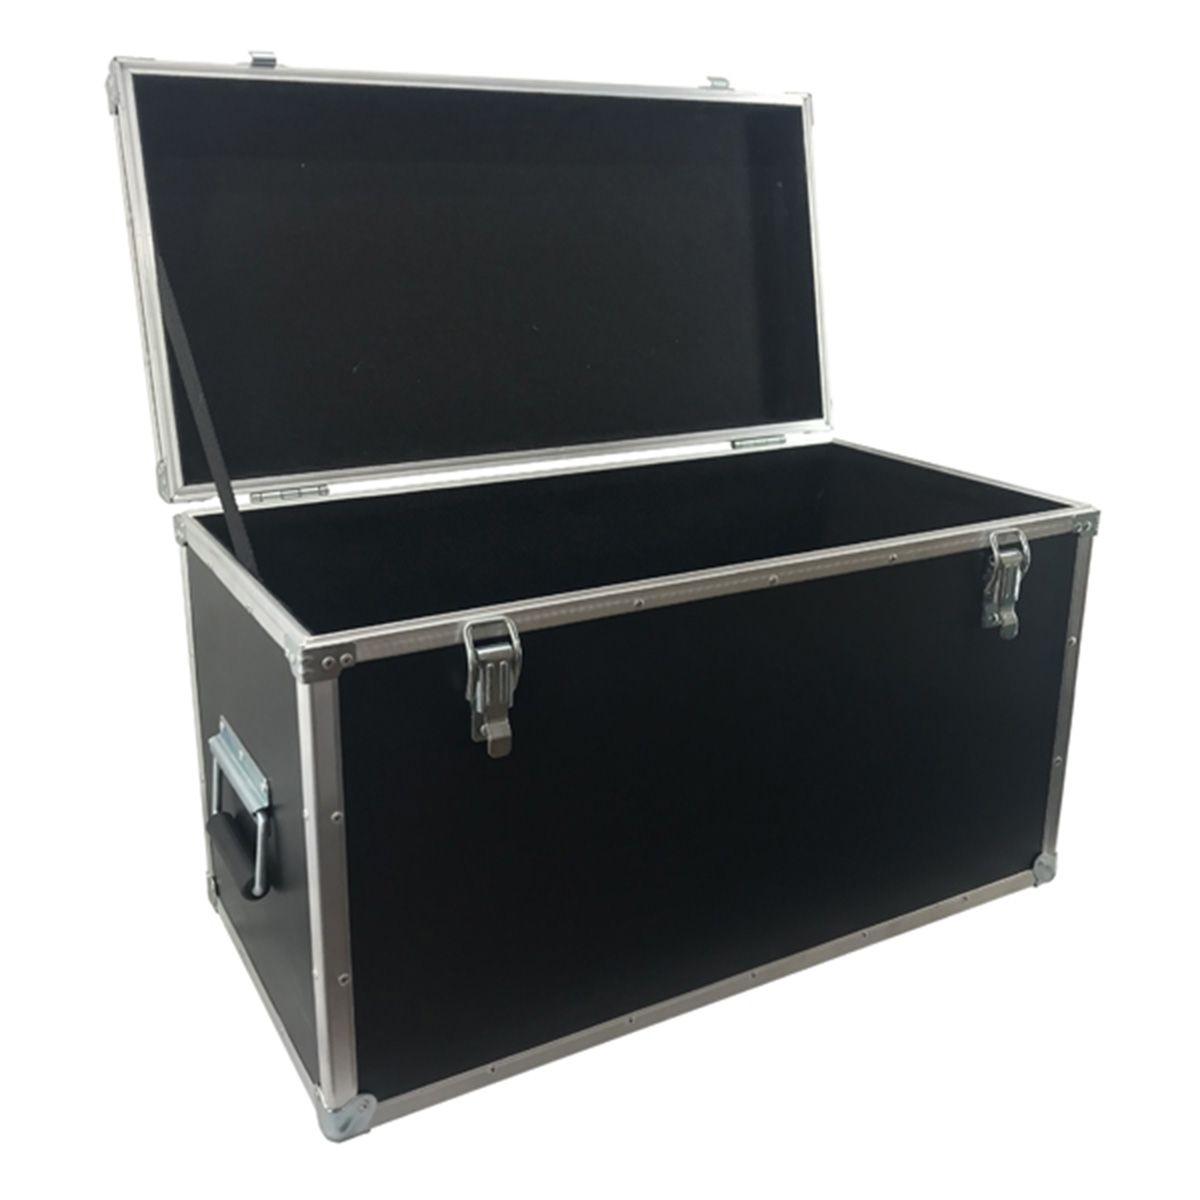 Hard Case Baú para Cabos 60 x 30 x 30cm - RS